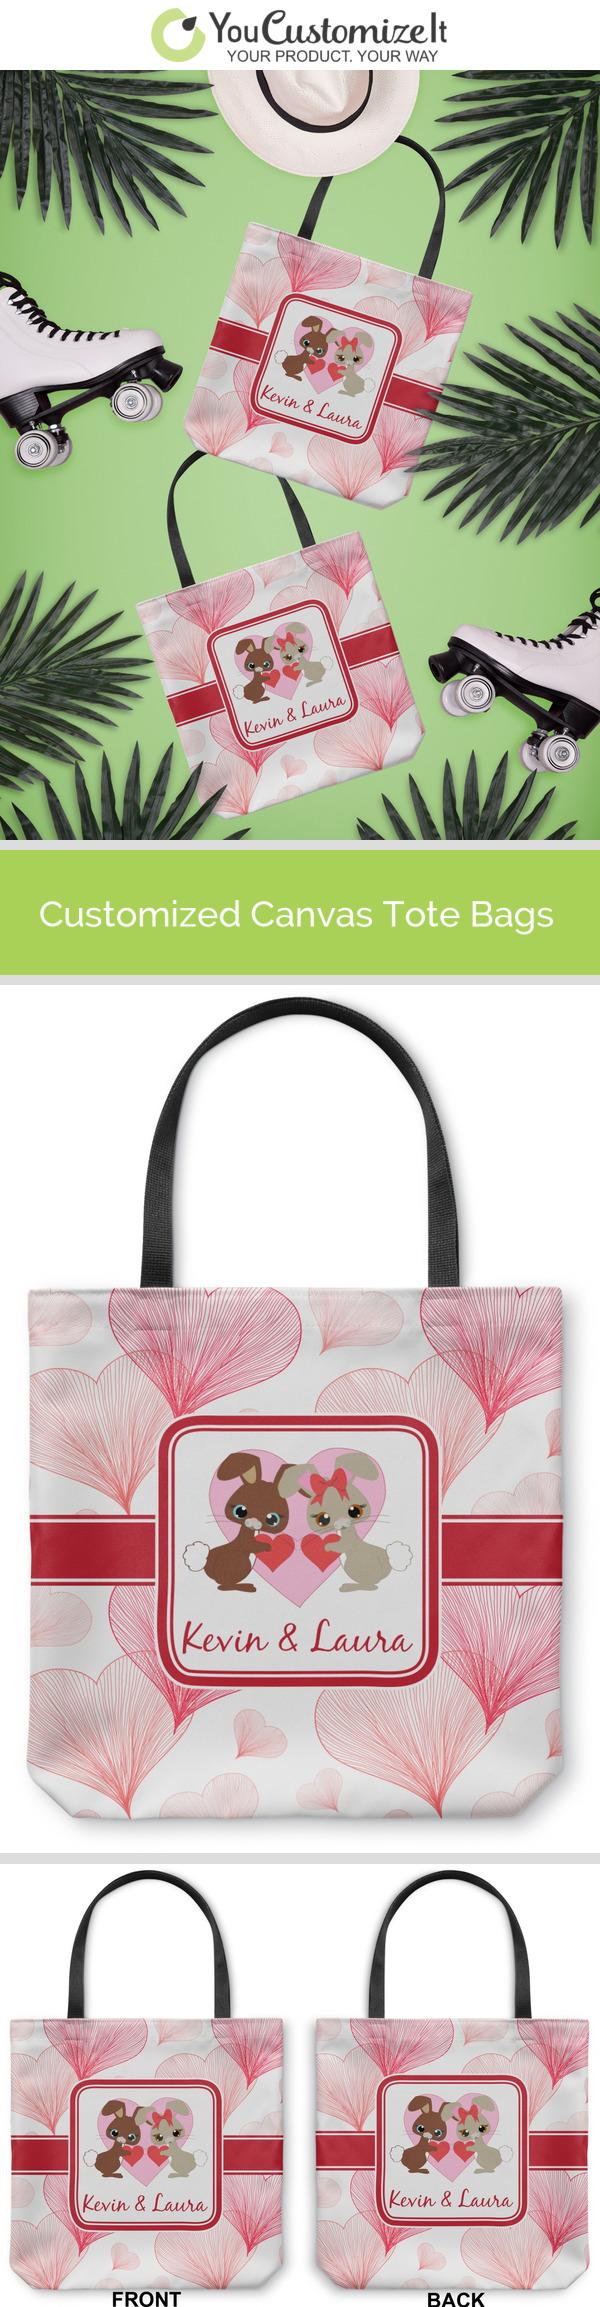 YouCustomizeIt Hearts /& Bunnies Duffel Bag Personalized